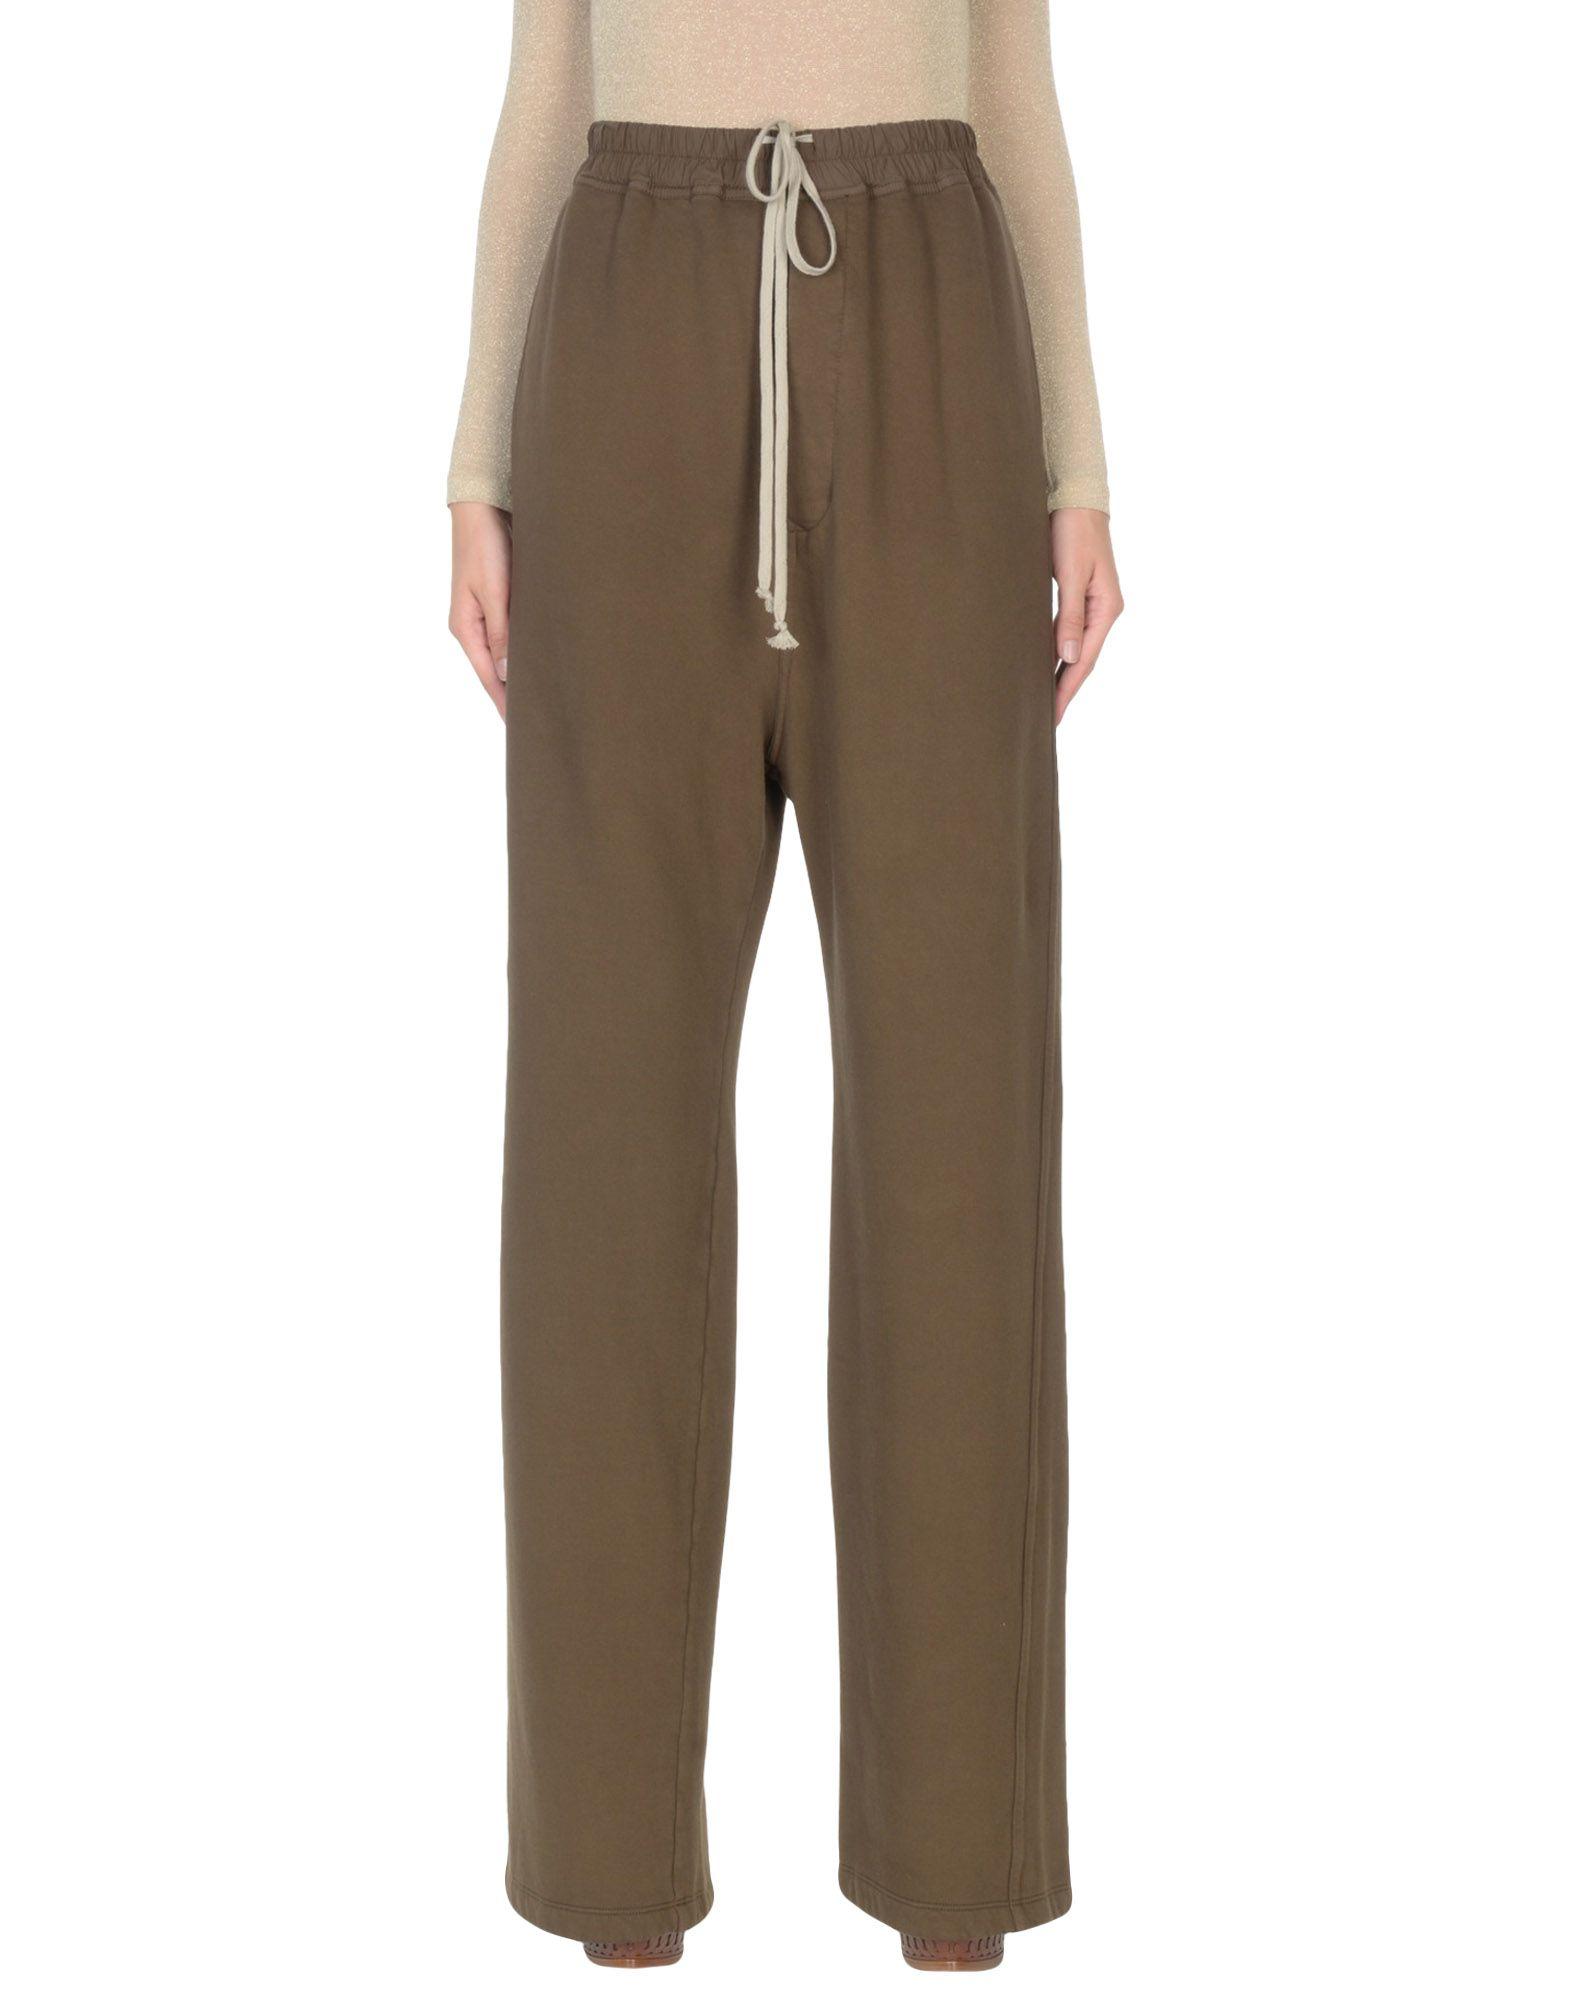 DRKSHDW by RICK OWENS Повседневные брюки брюки quelle rick cardona by heine 3161